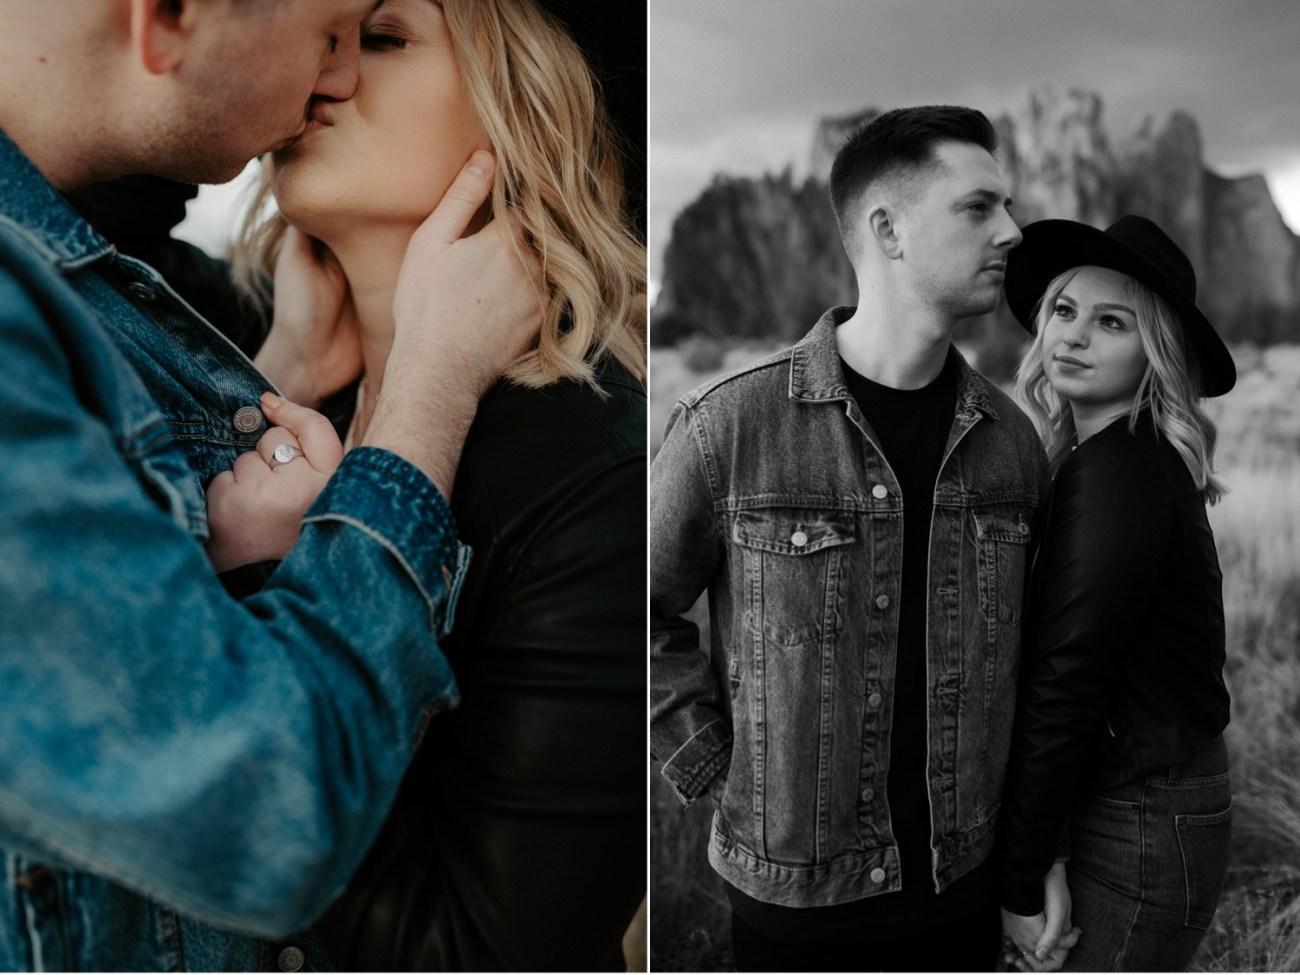 Oregon Smith Rock State Park Couple Session PNW Elopement Photographer Bend Wedding Photographer Portland Wedding Photographer Anais Possamai Photo 012